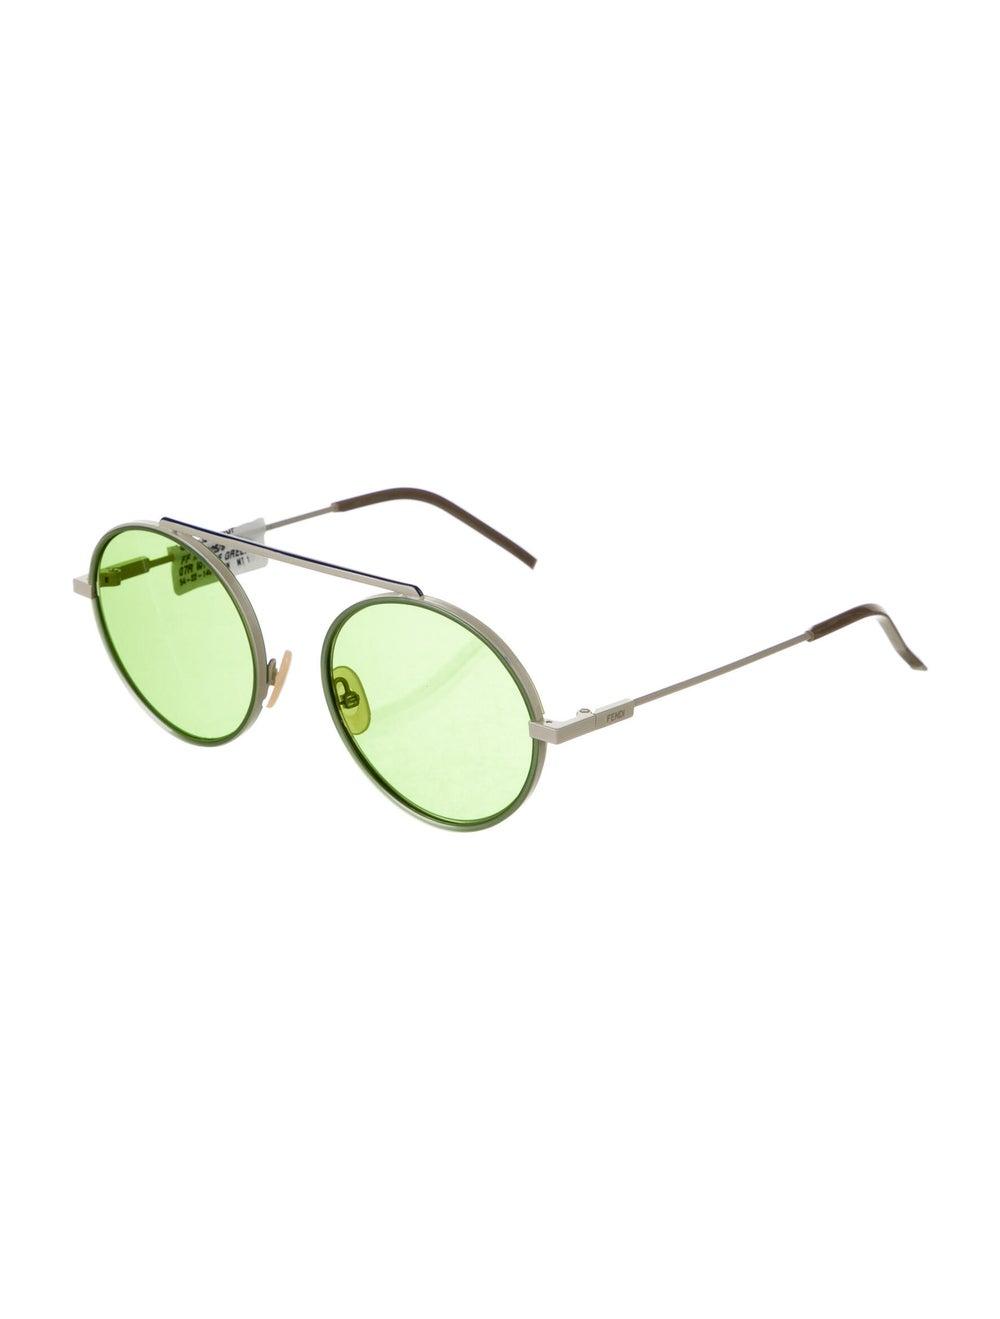 Fendi Round Tinted Sunglasses - image 2